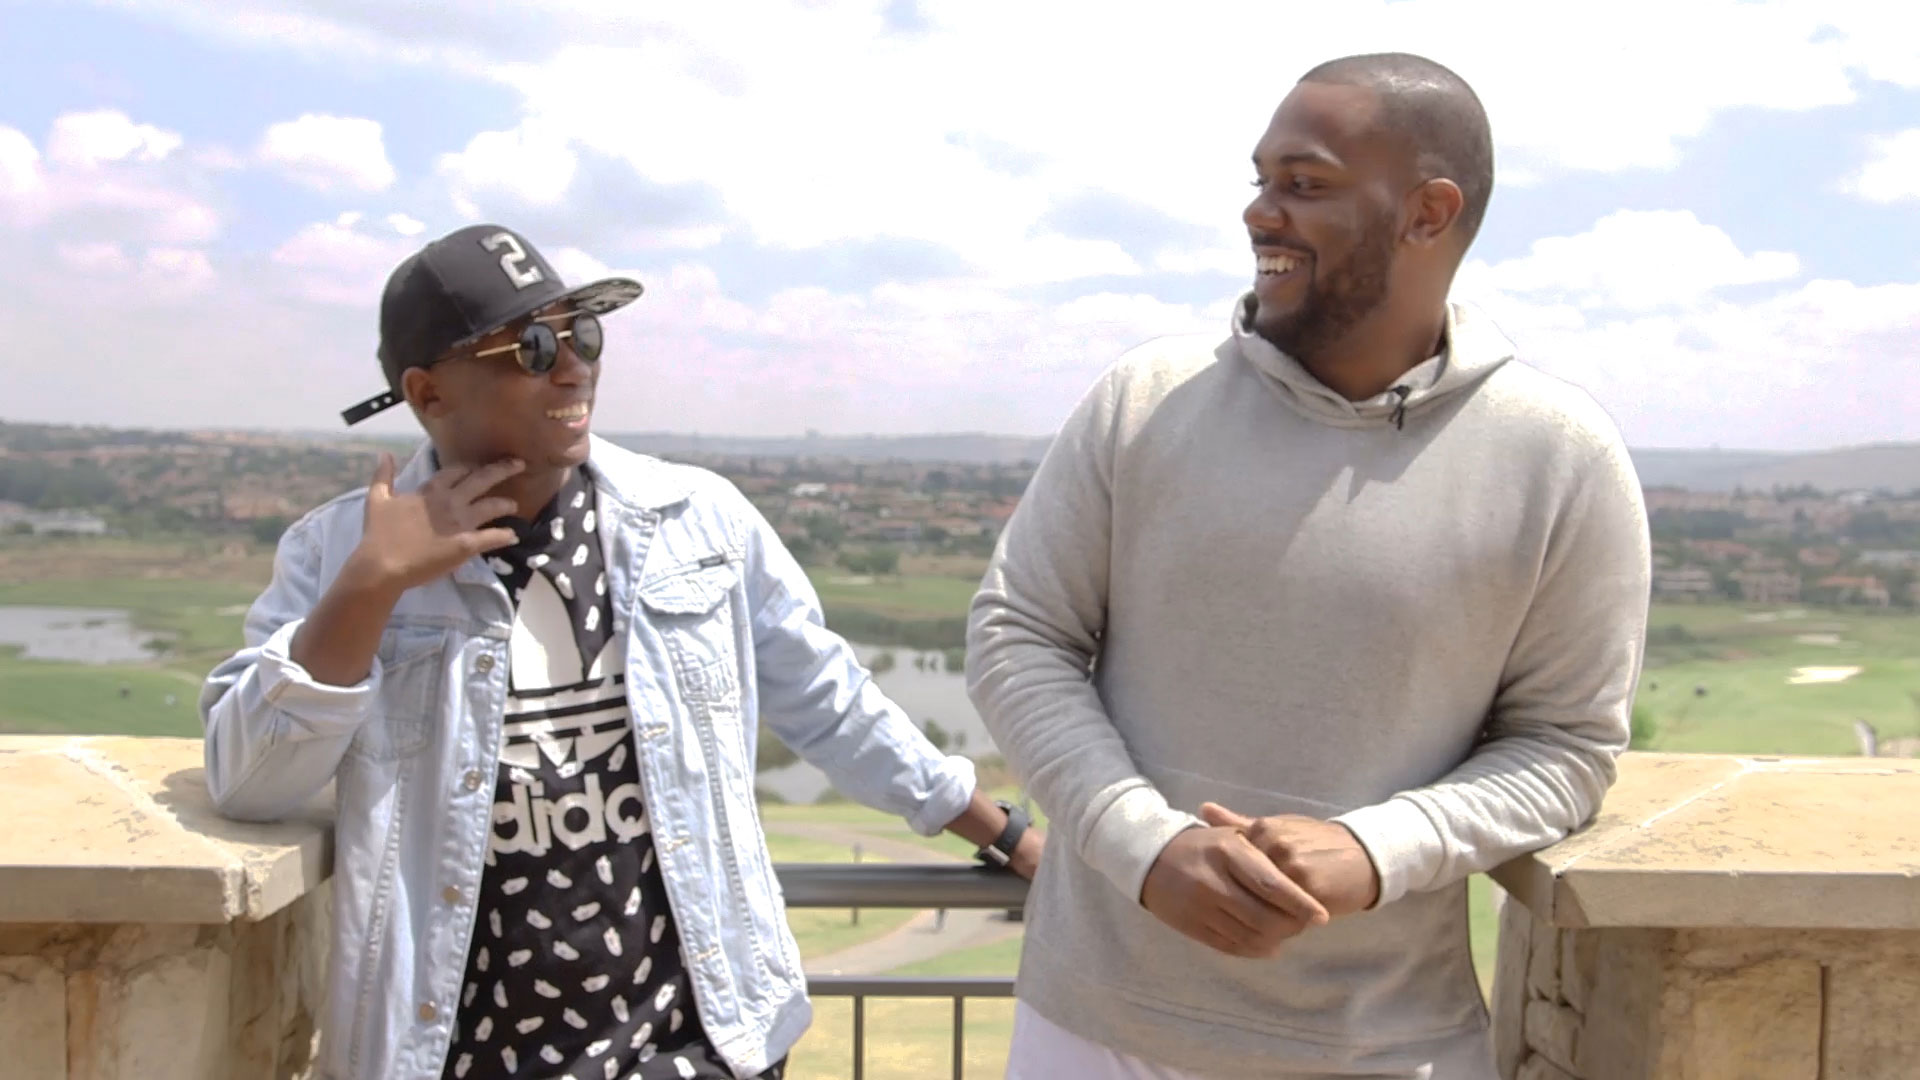 DJ SuperNova and Khuli Chana in Roodepoort, Johannesburg. Credit: Ken FTW